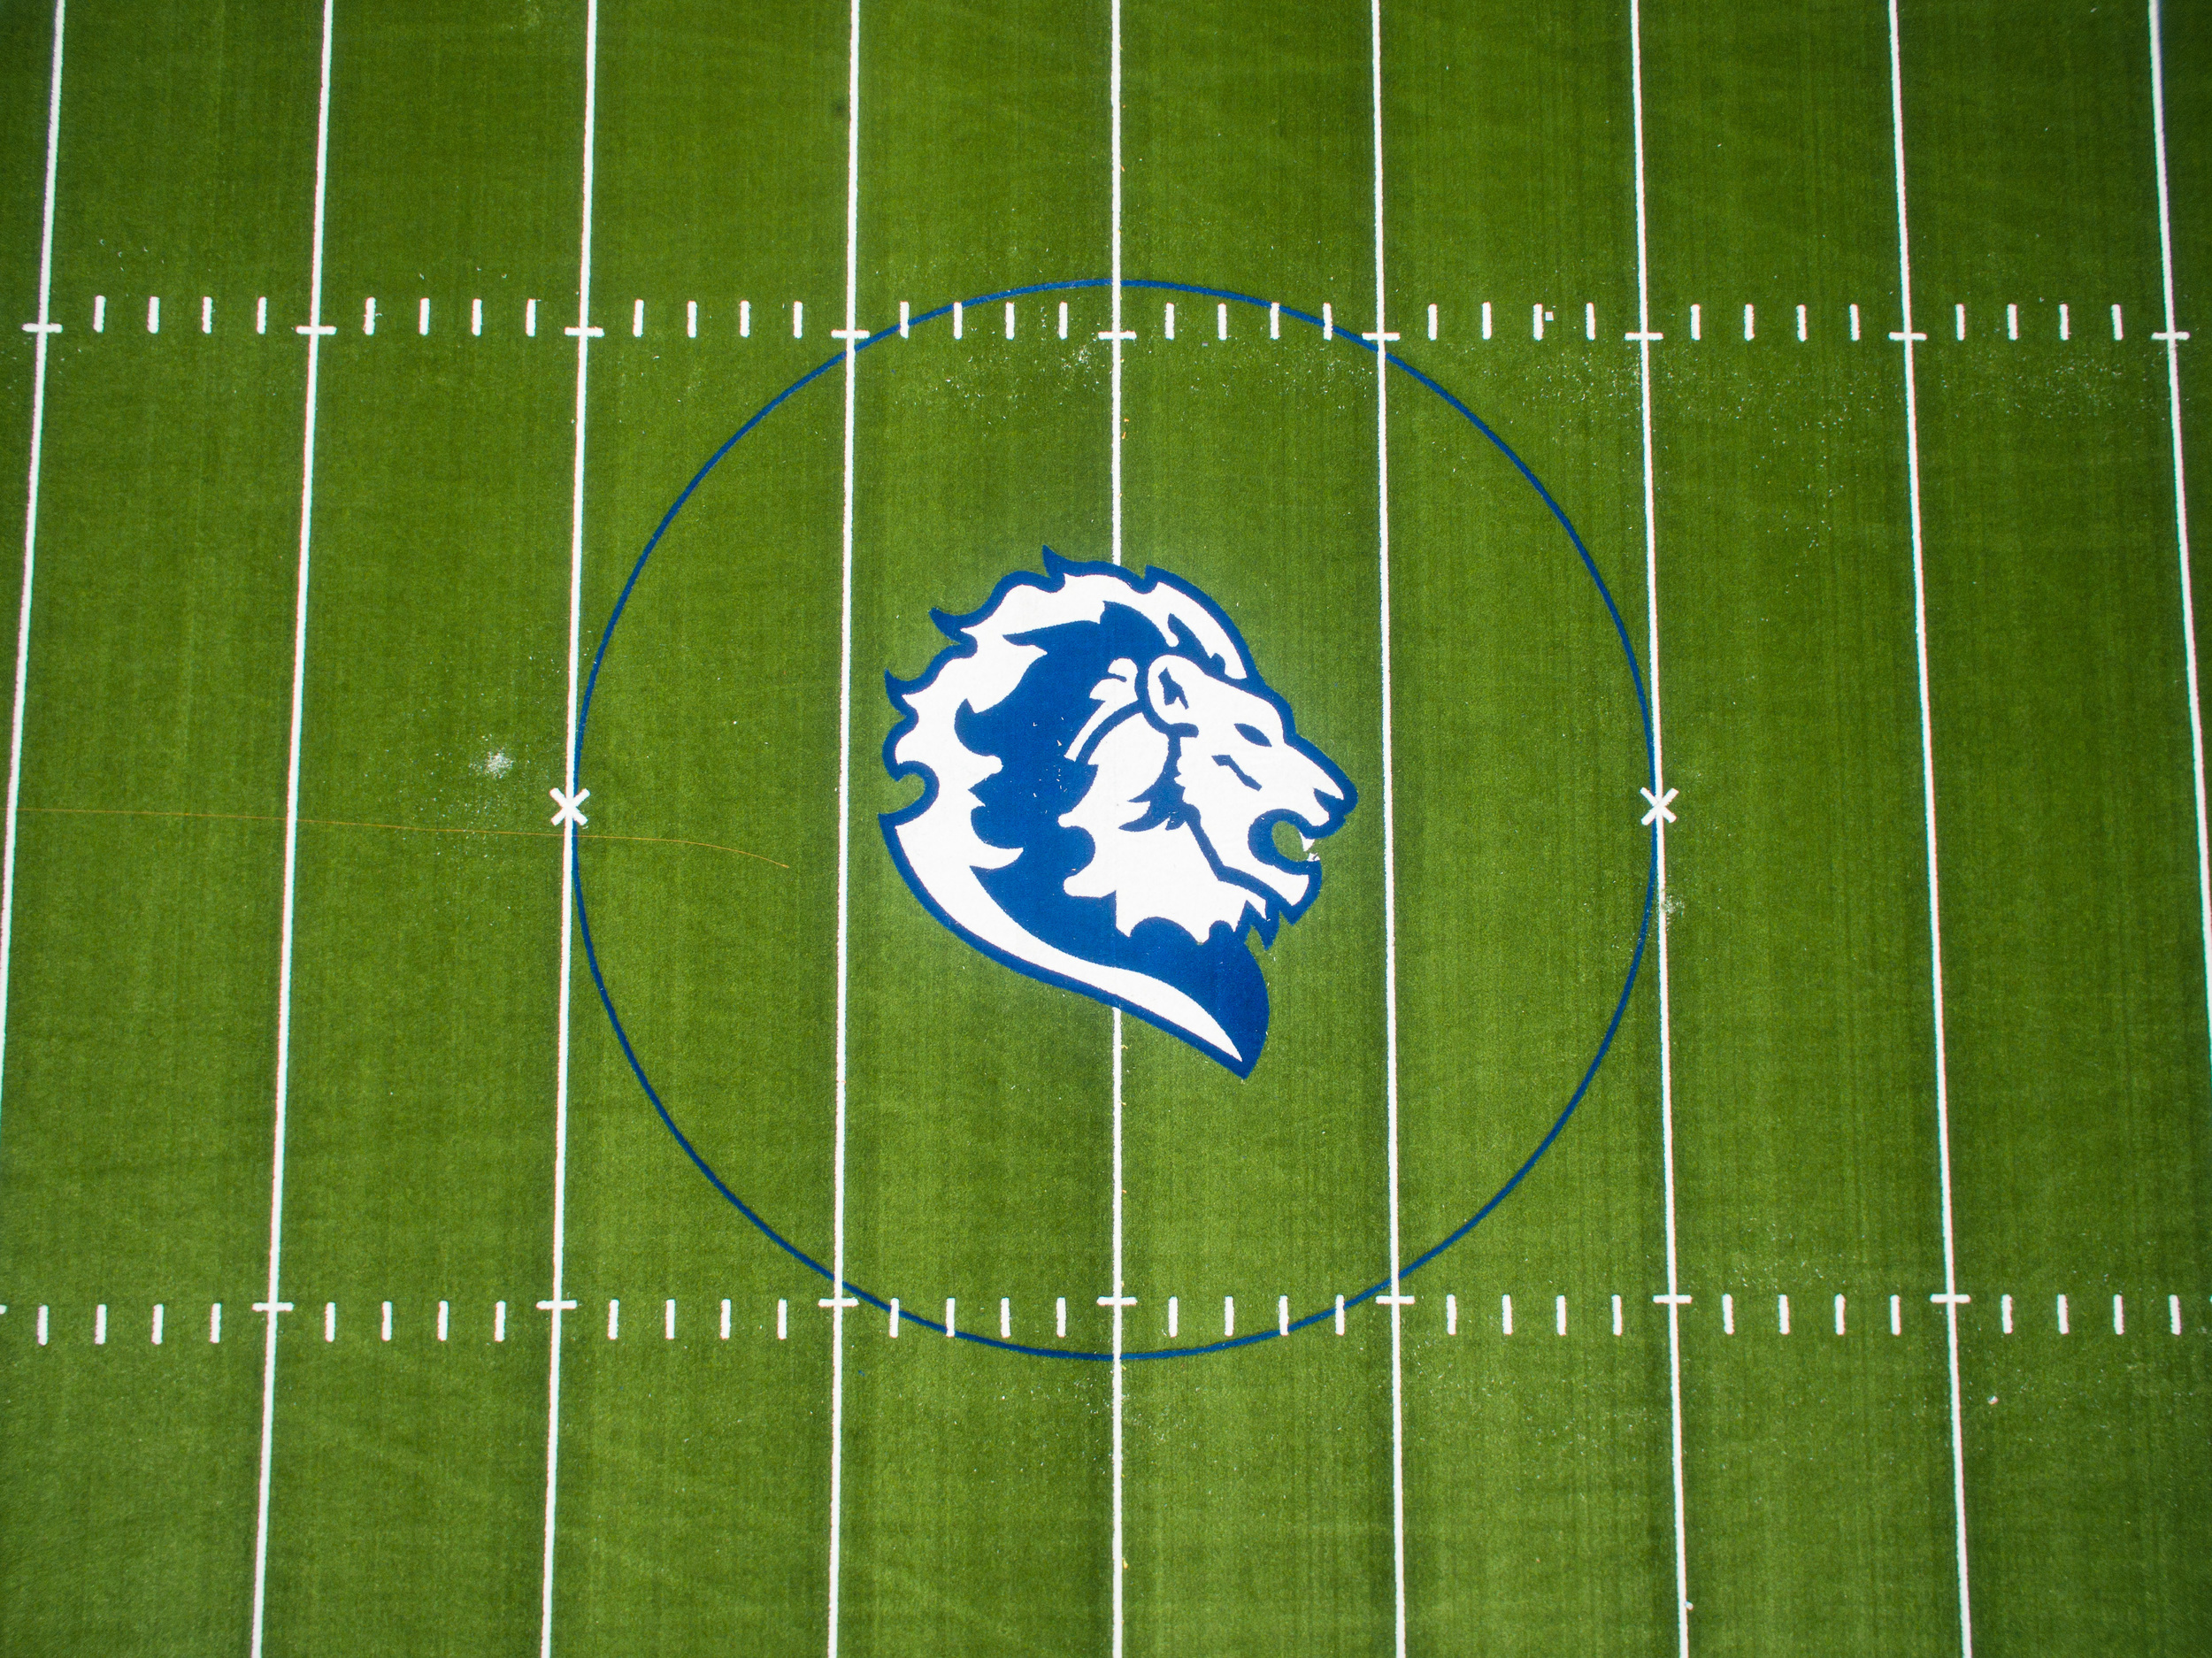 MHA Football Field 7-26-15-1.jpg